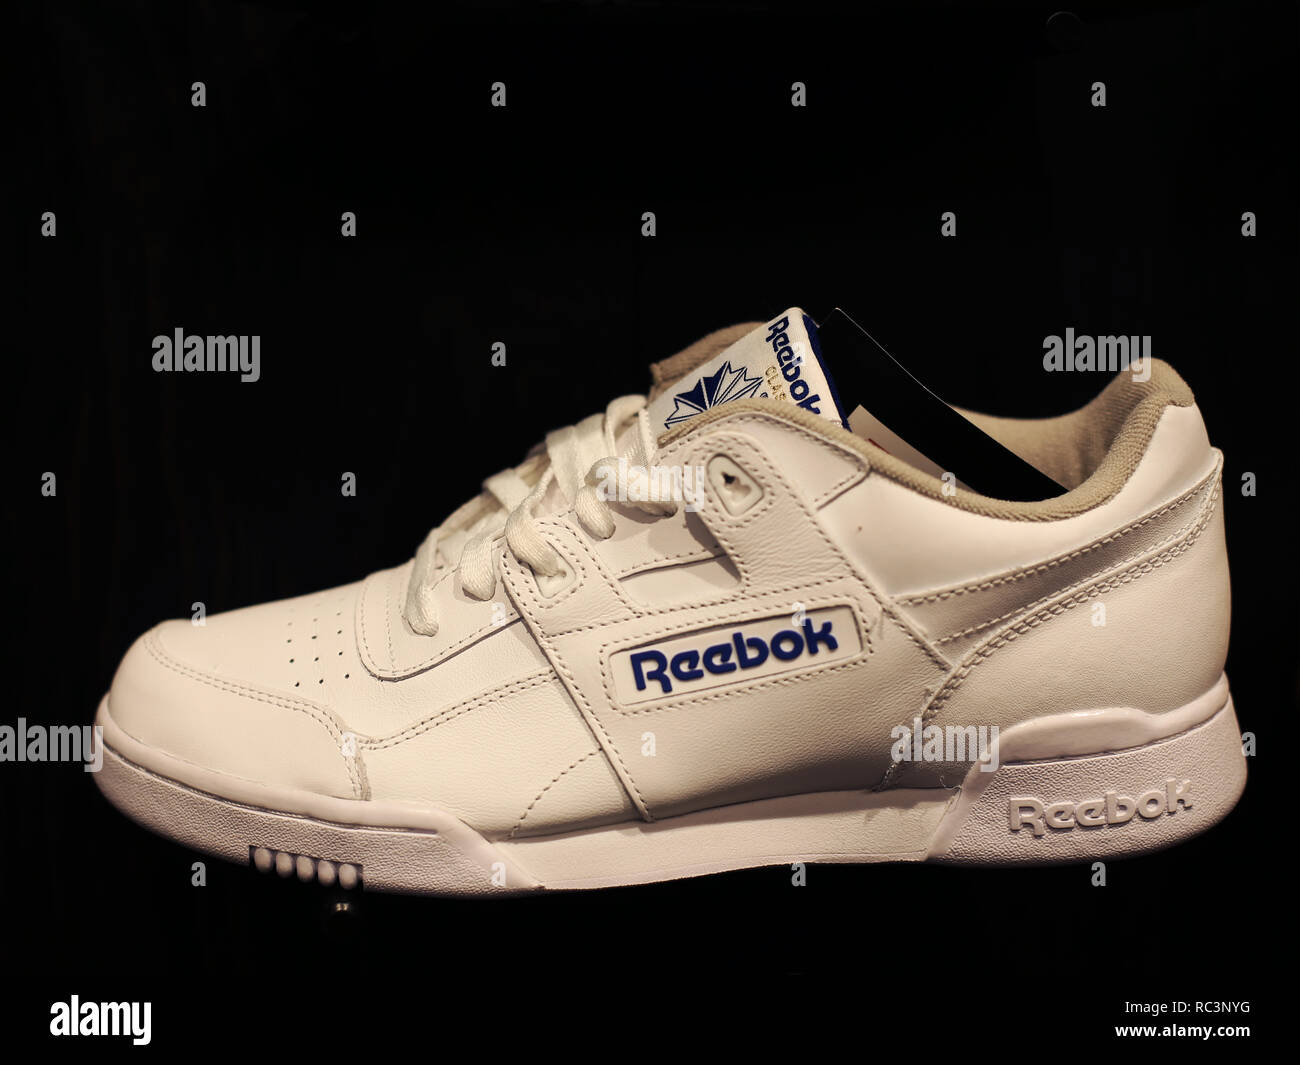 000d15692fc77e Reebok Shoes Stock Photos   Reebok Shoes Stock Images - Page 2 - Alamy